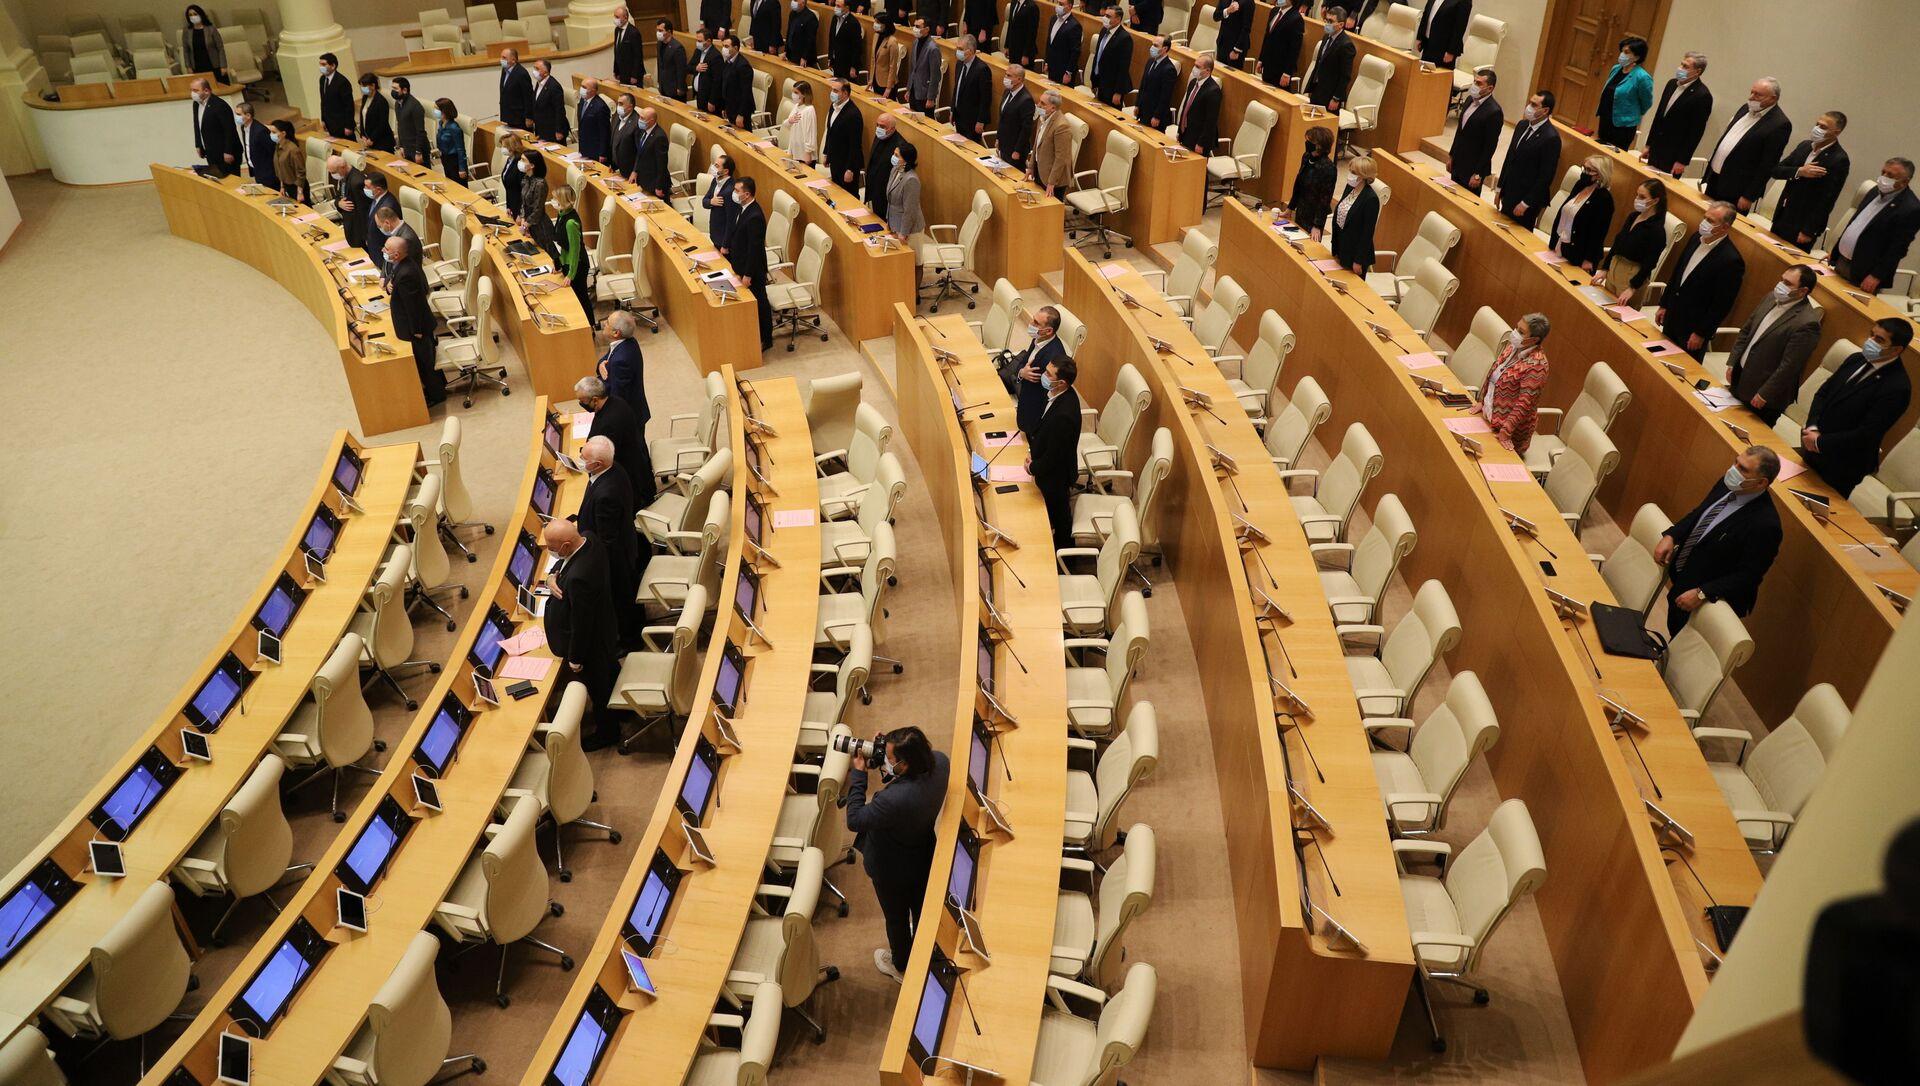 Парламент Грузии - начало заседания - Sputnik Грузия, 1920, 22.07.2021